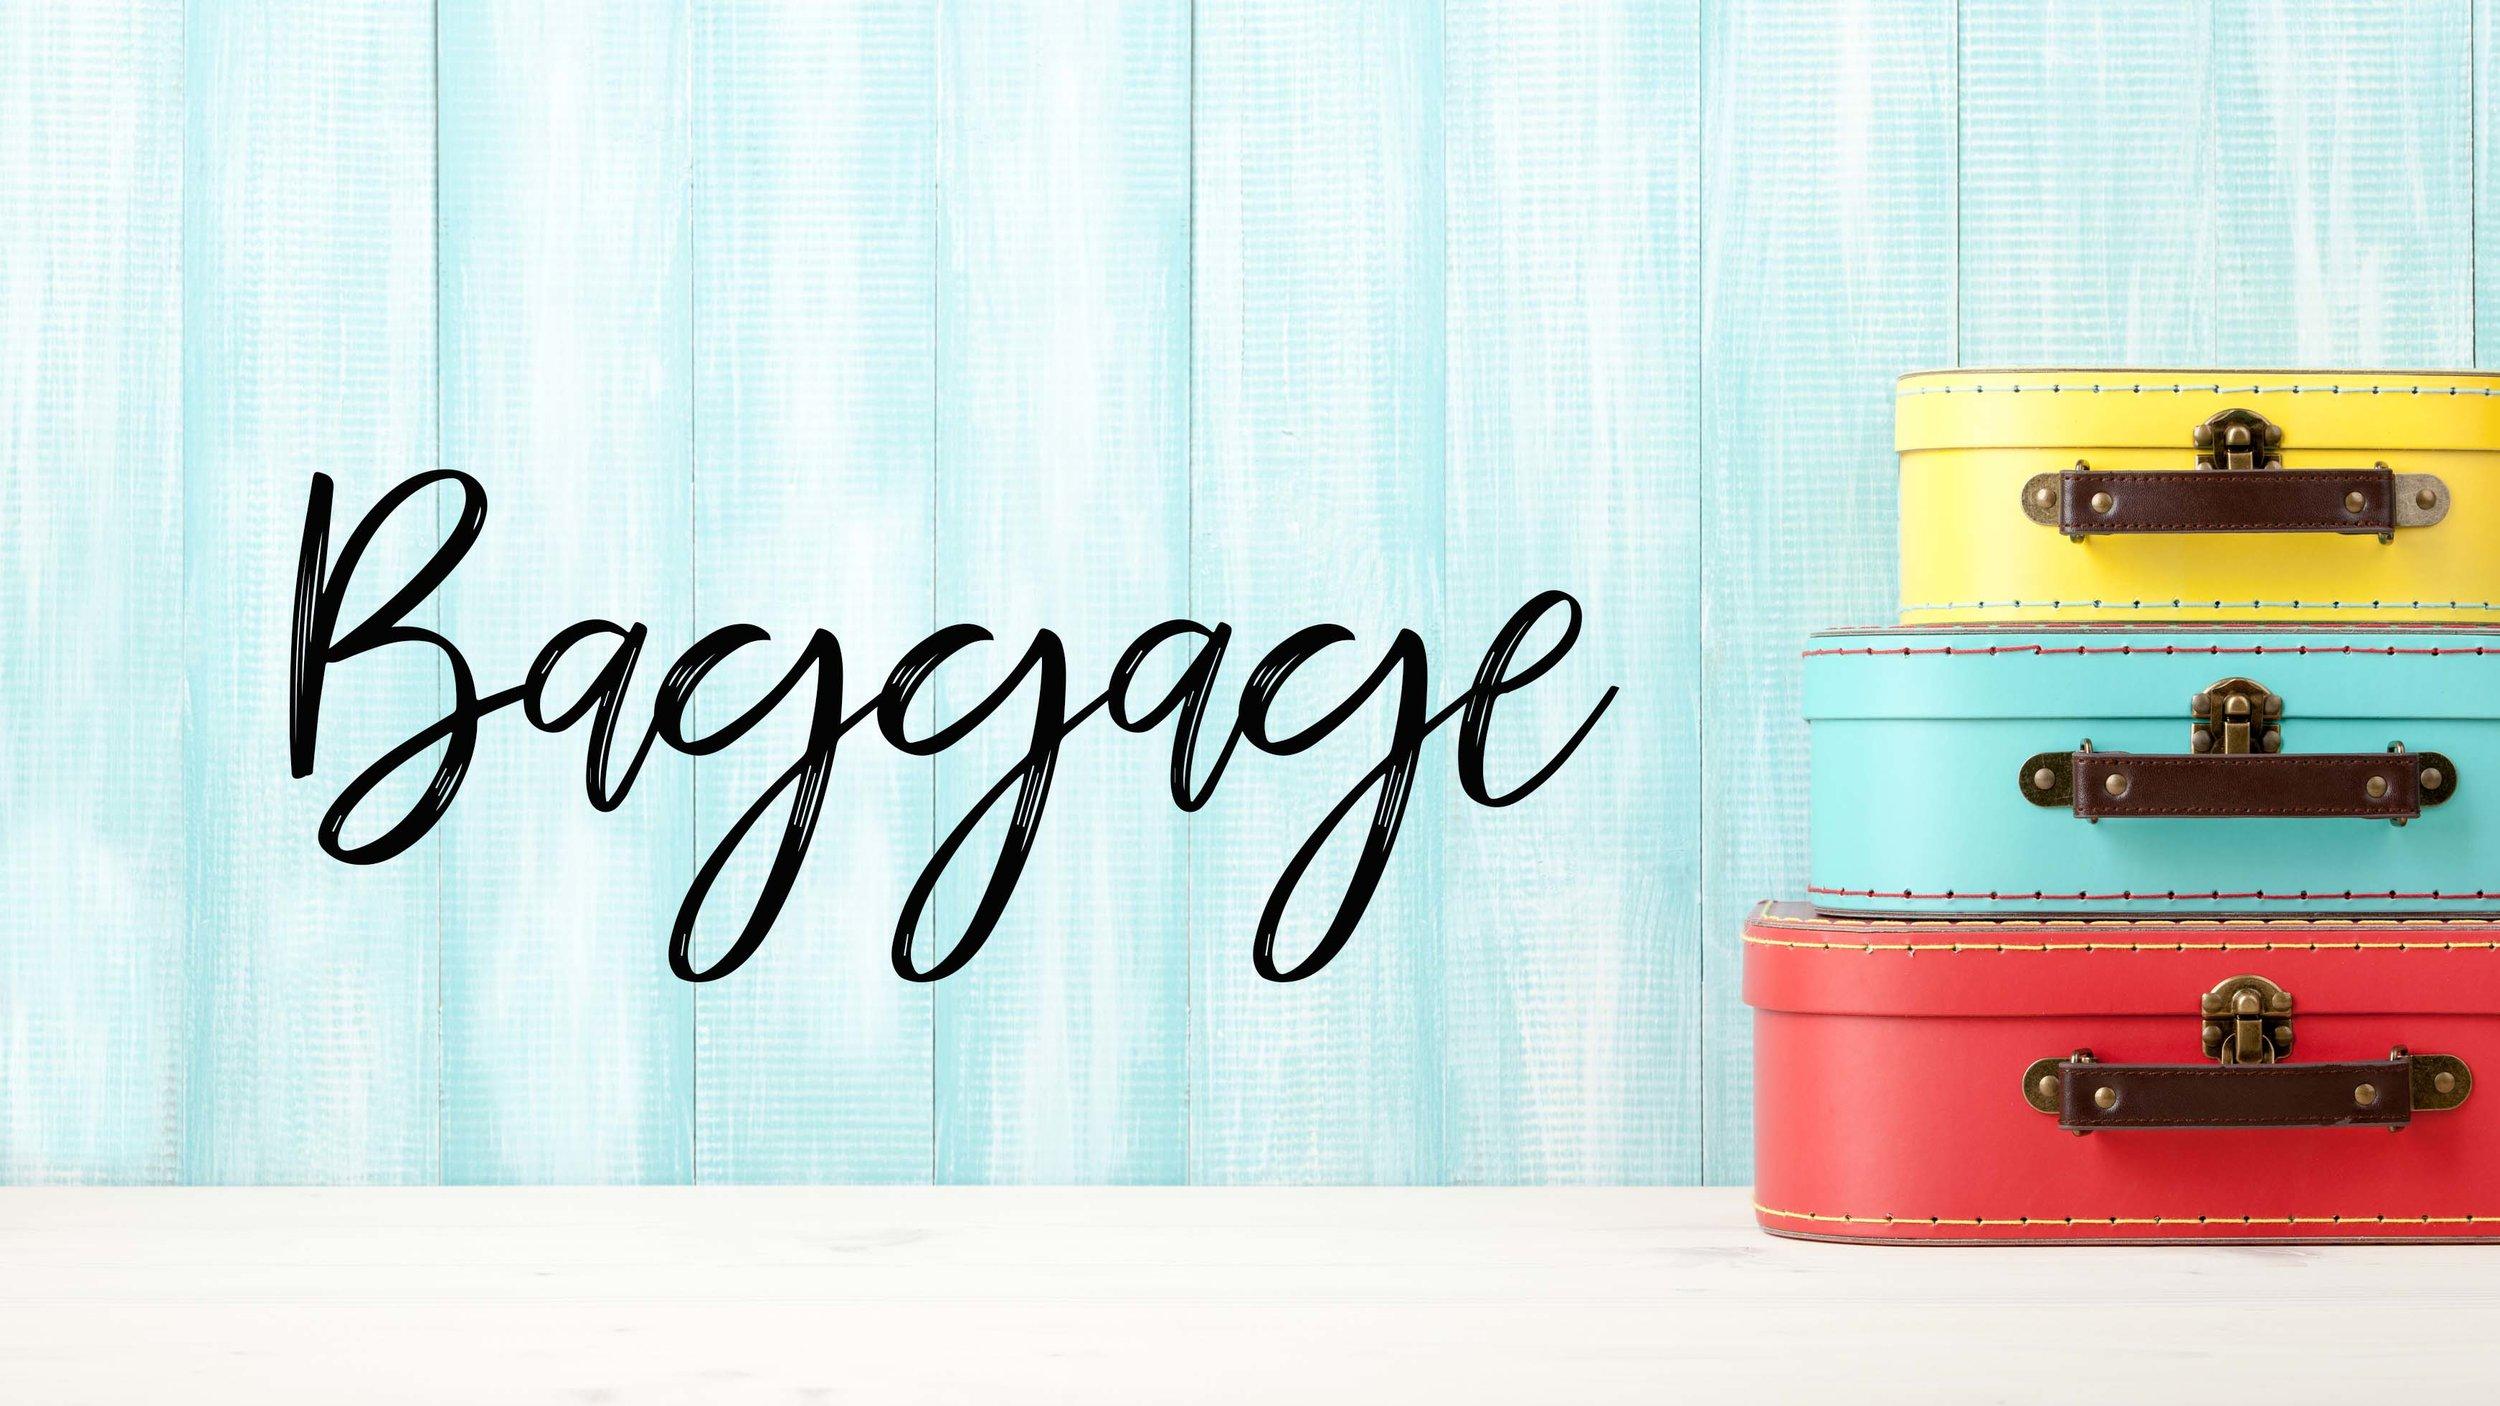 Luggage, baggage, family travel baggage